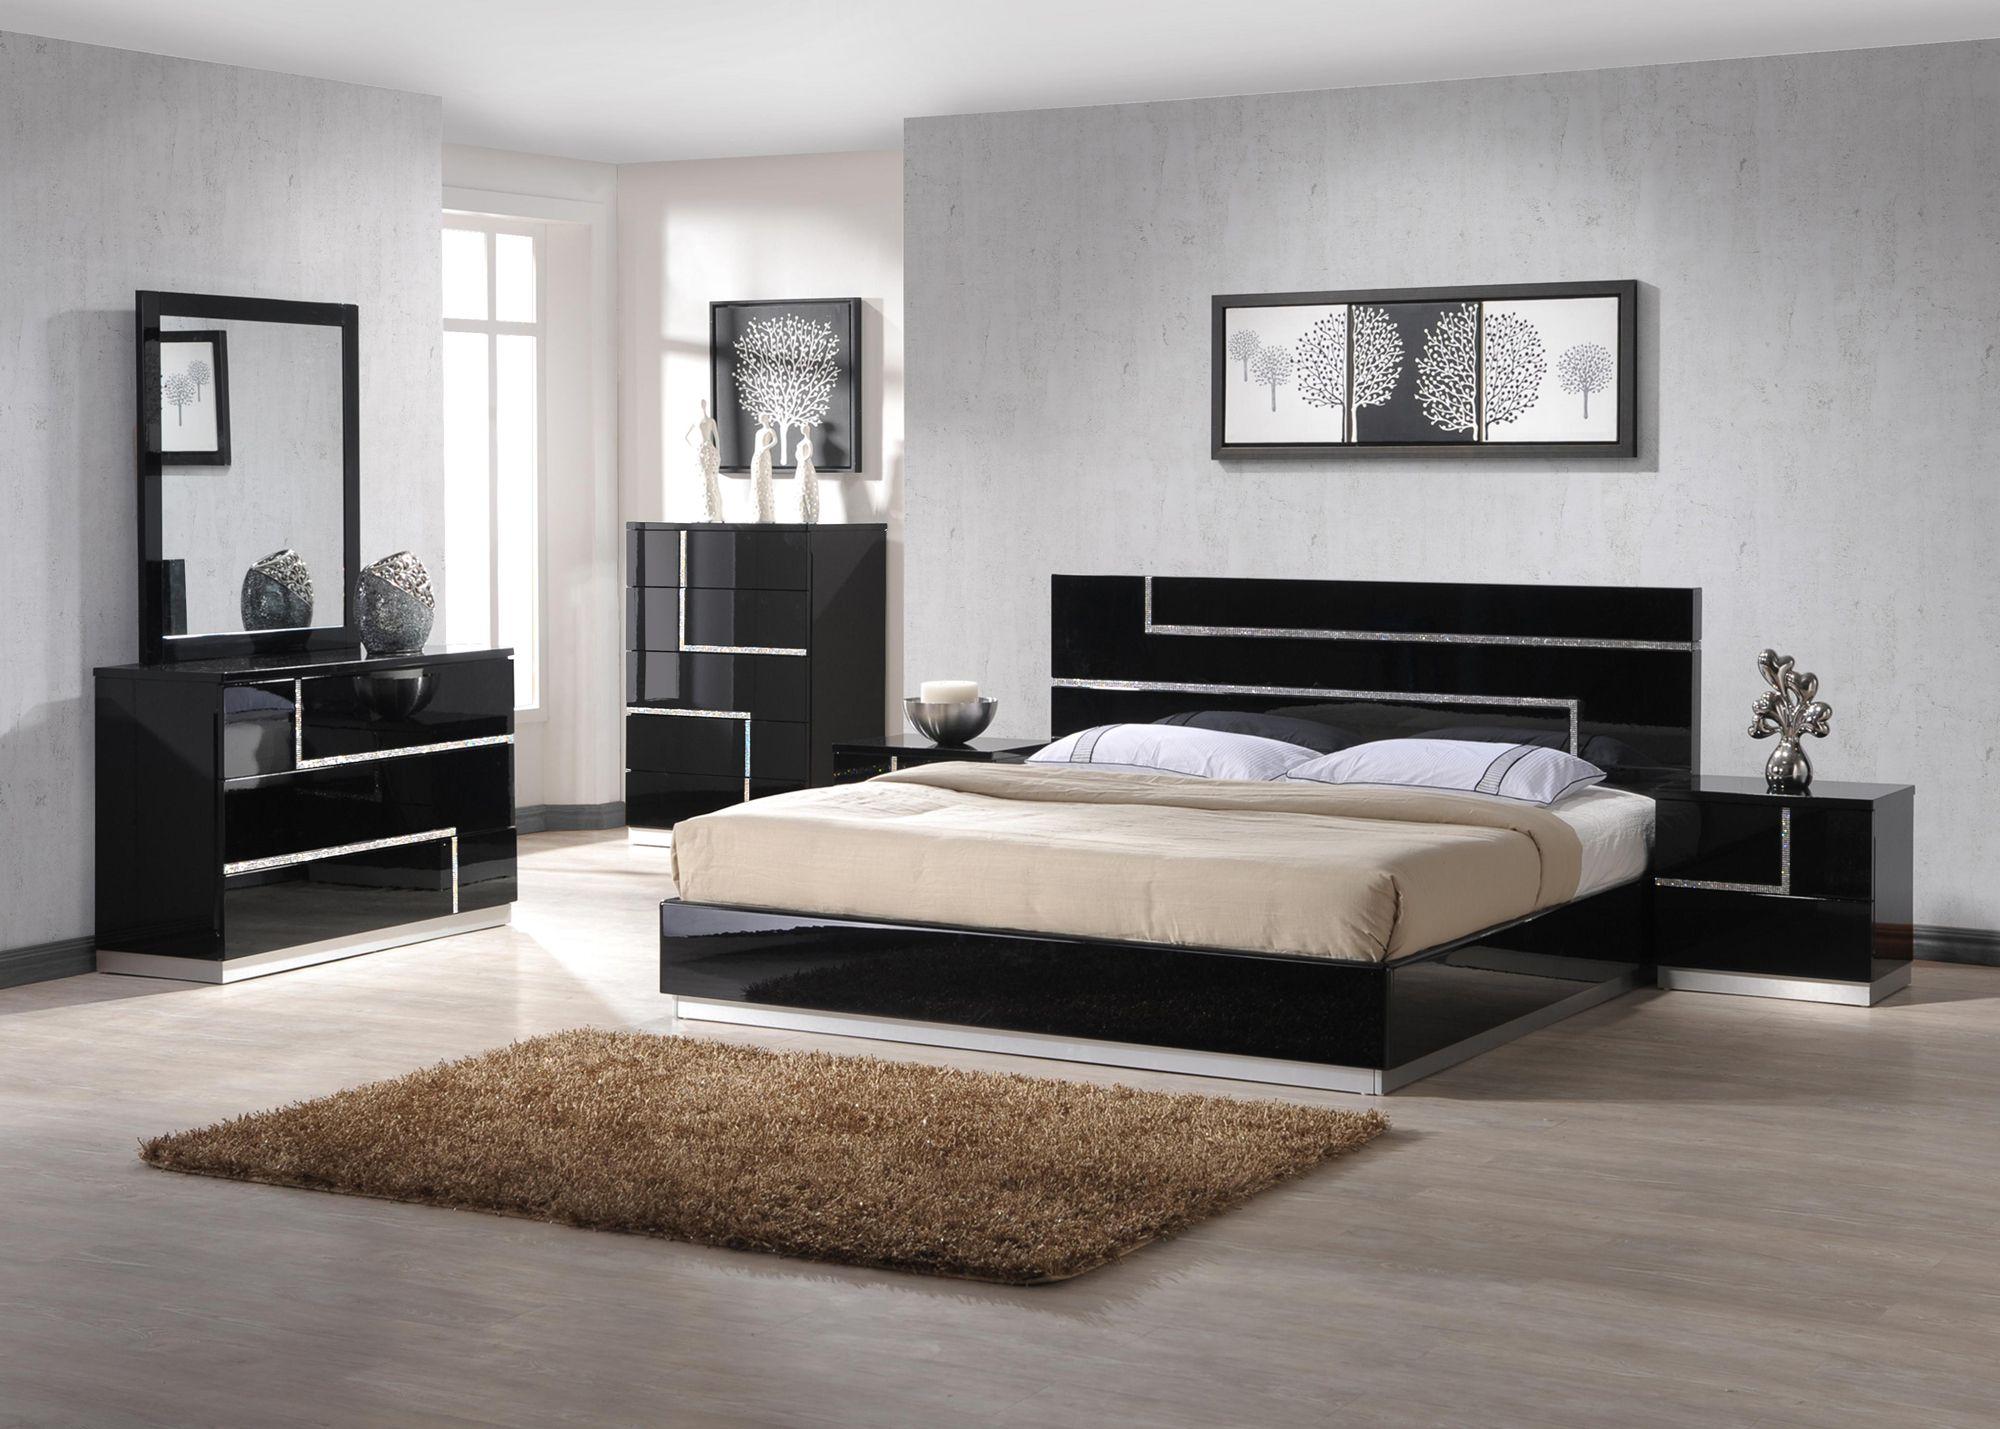 Komplette Schlafzimmer Möbel Sets Schlafzimmer design